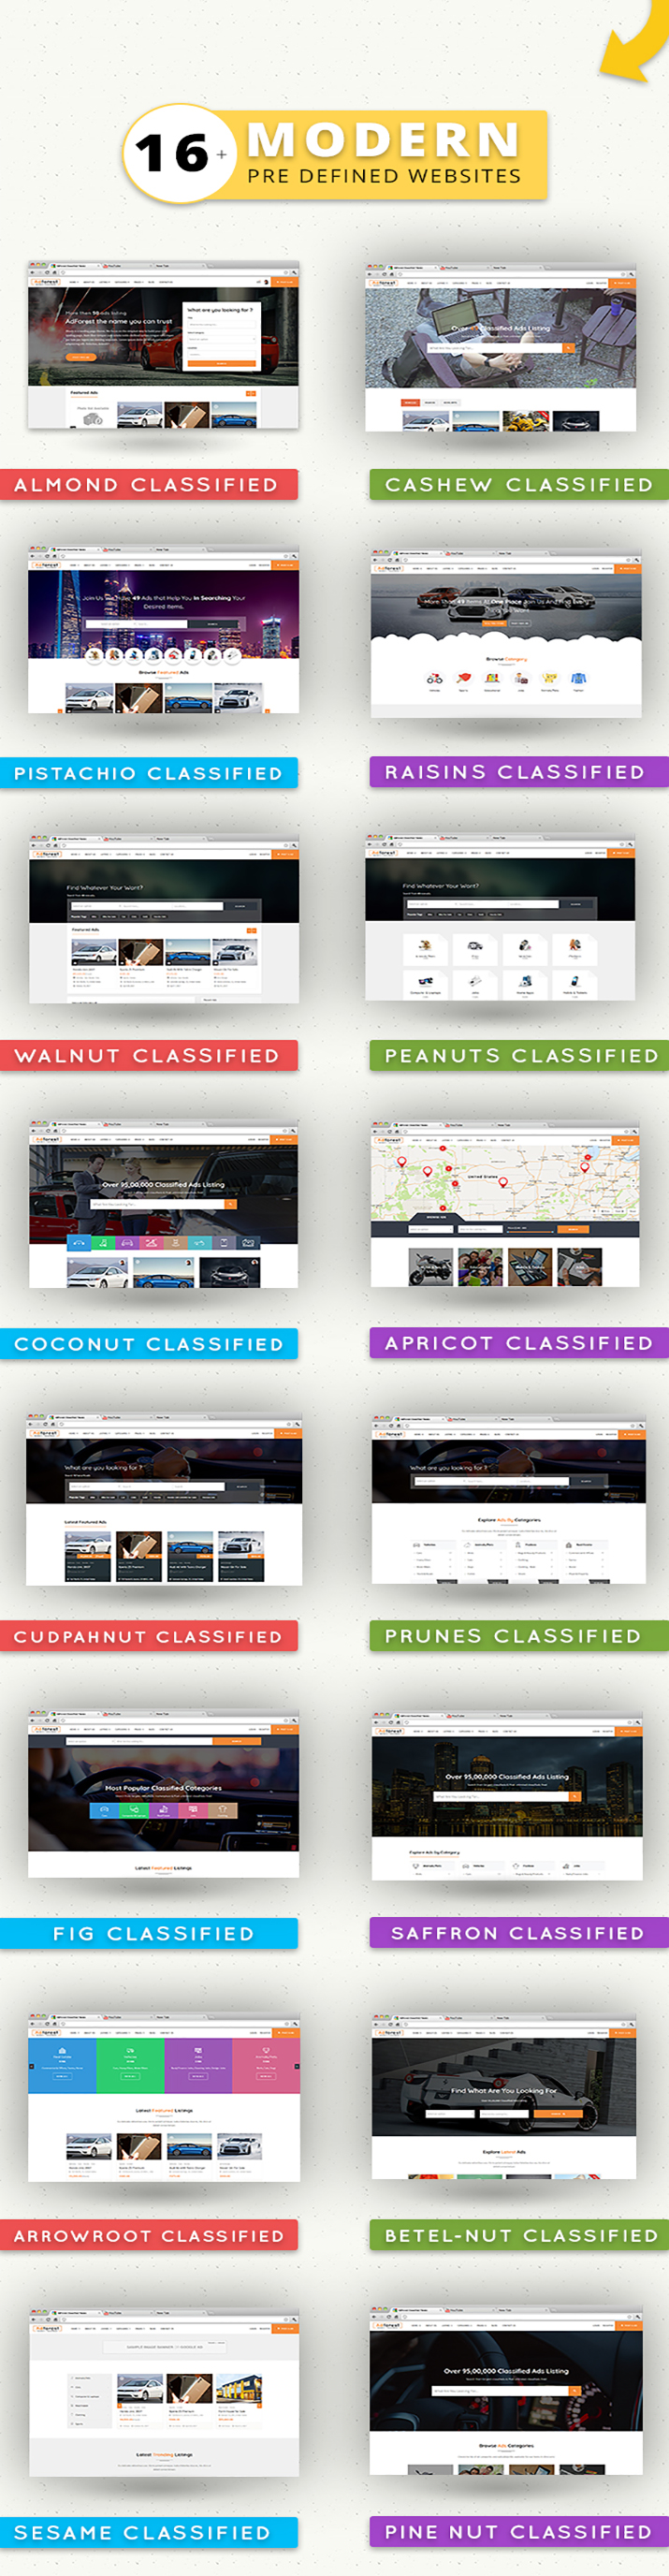 adforest-classifieds-theme-demos